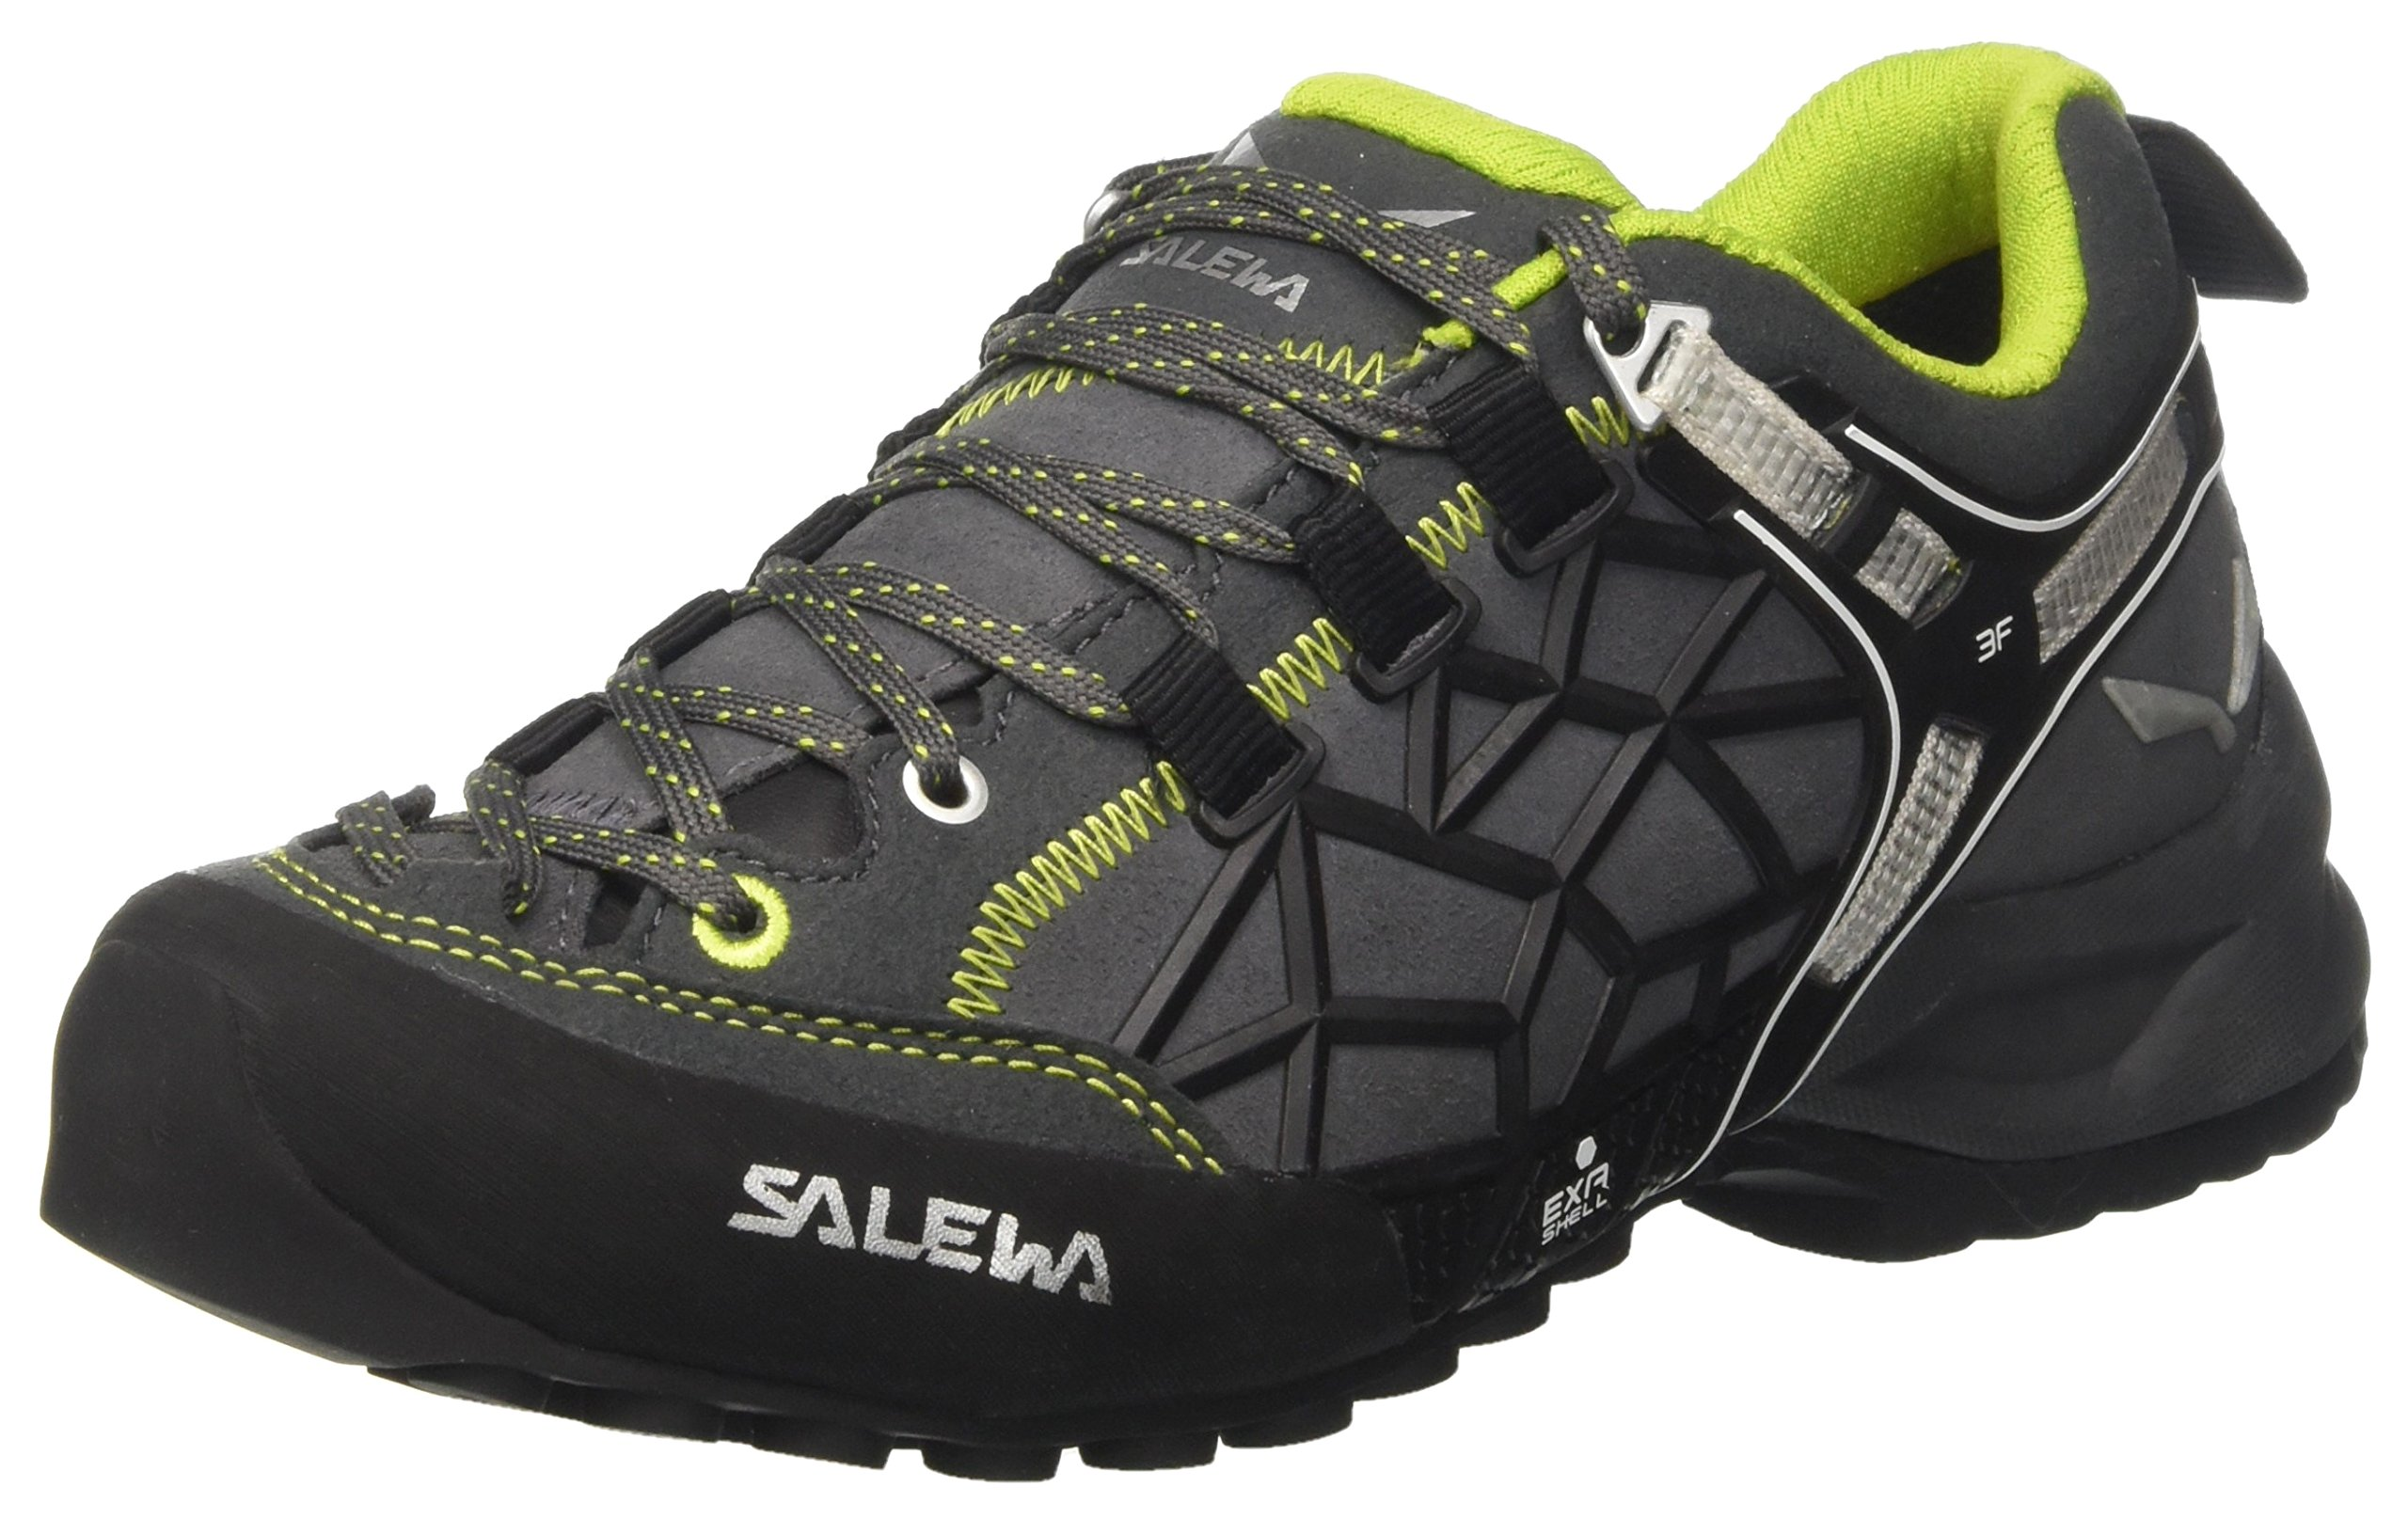 Salewa Unisex Wildfire Pro Approach Shoe, Carbon/Green, 9